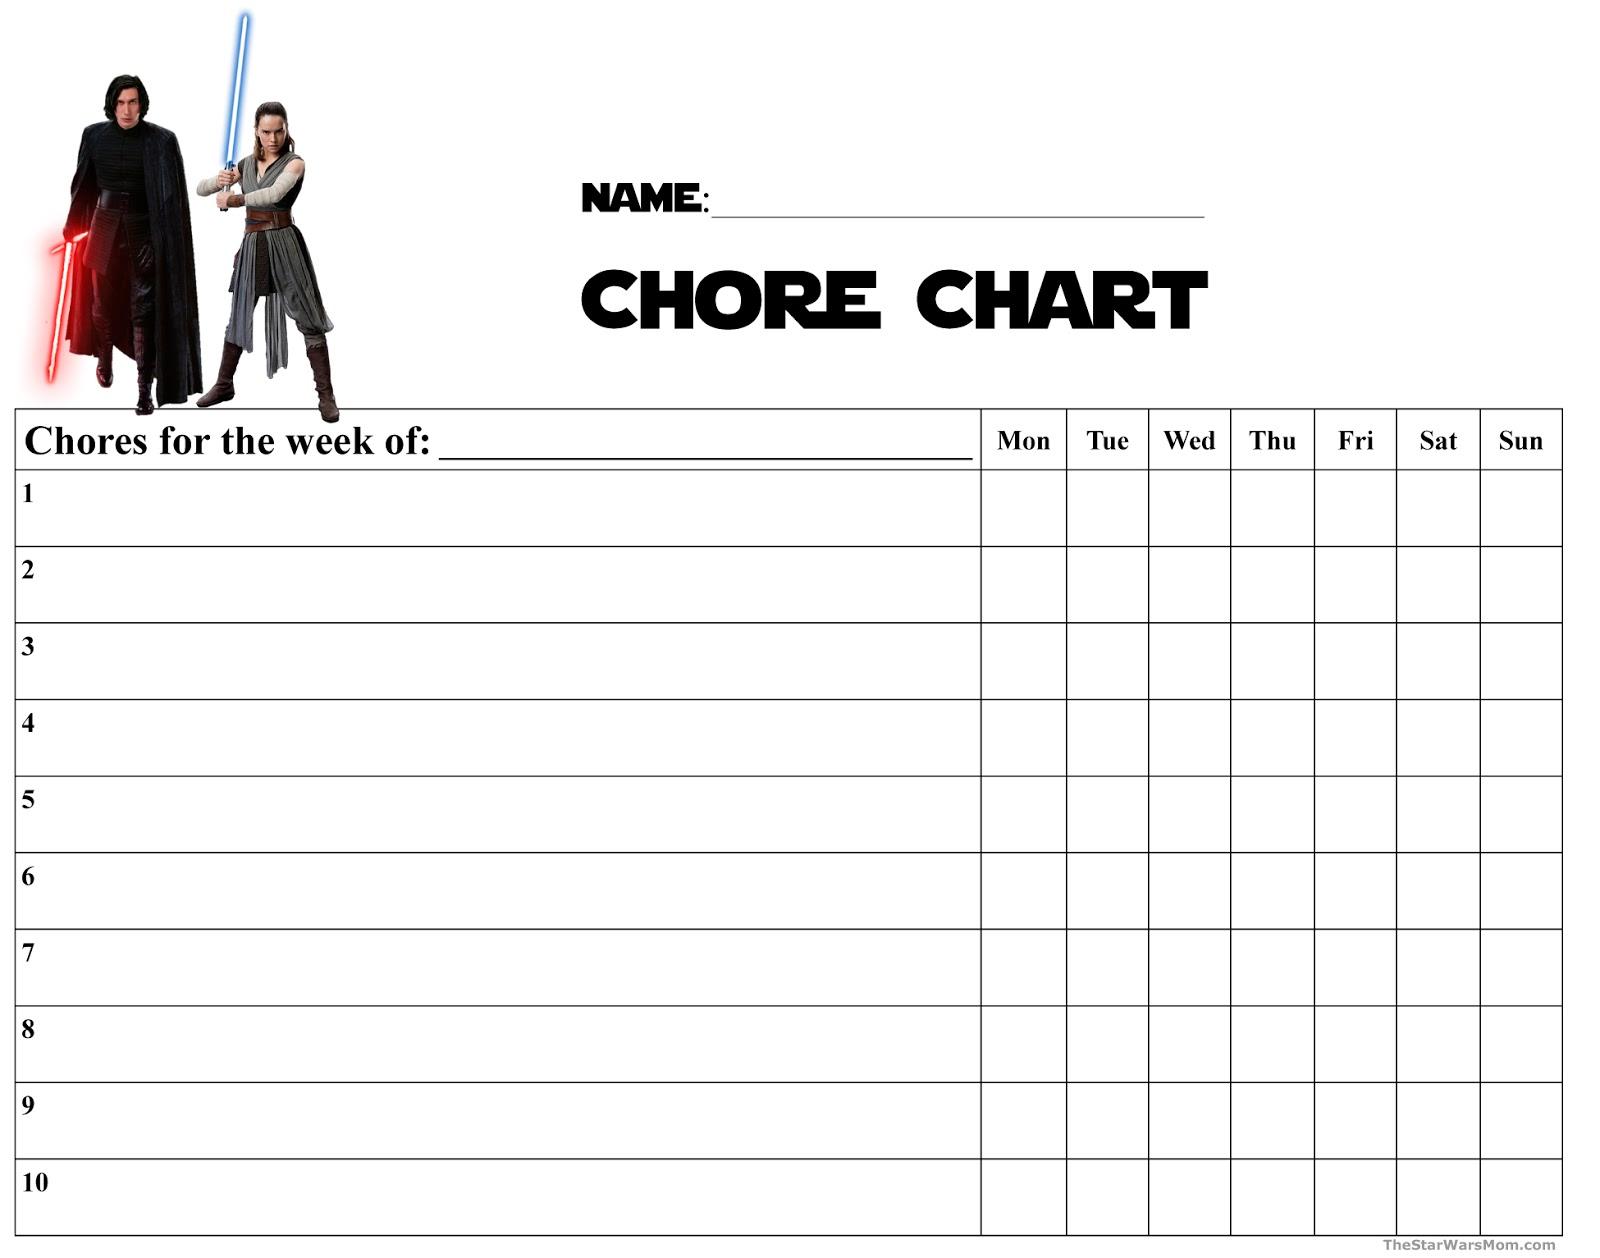 Kylo Ren and Rey Chore Chart - Star Wars The Last Jedi ...